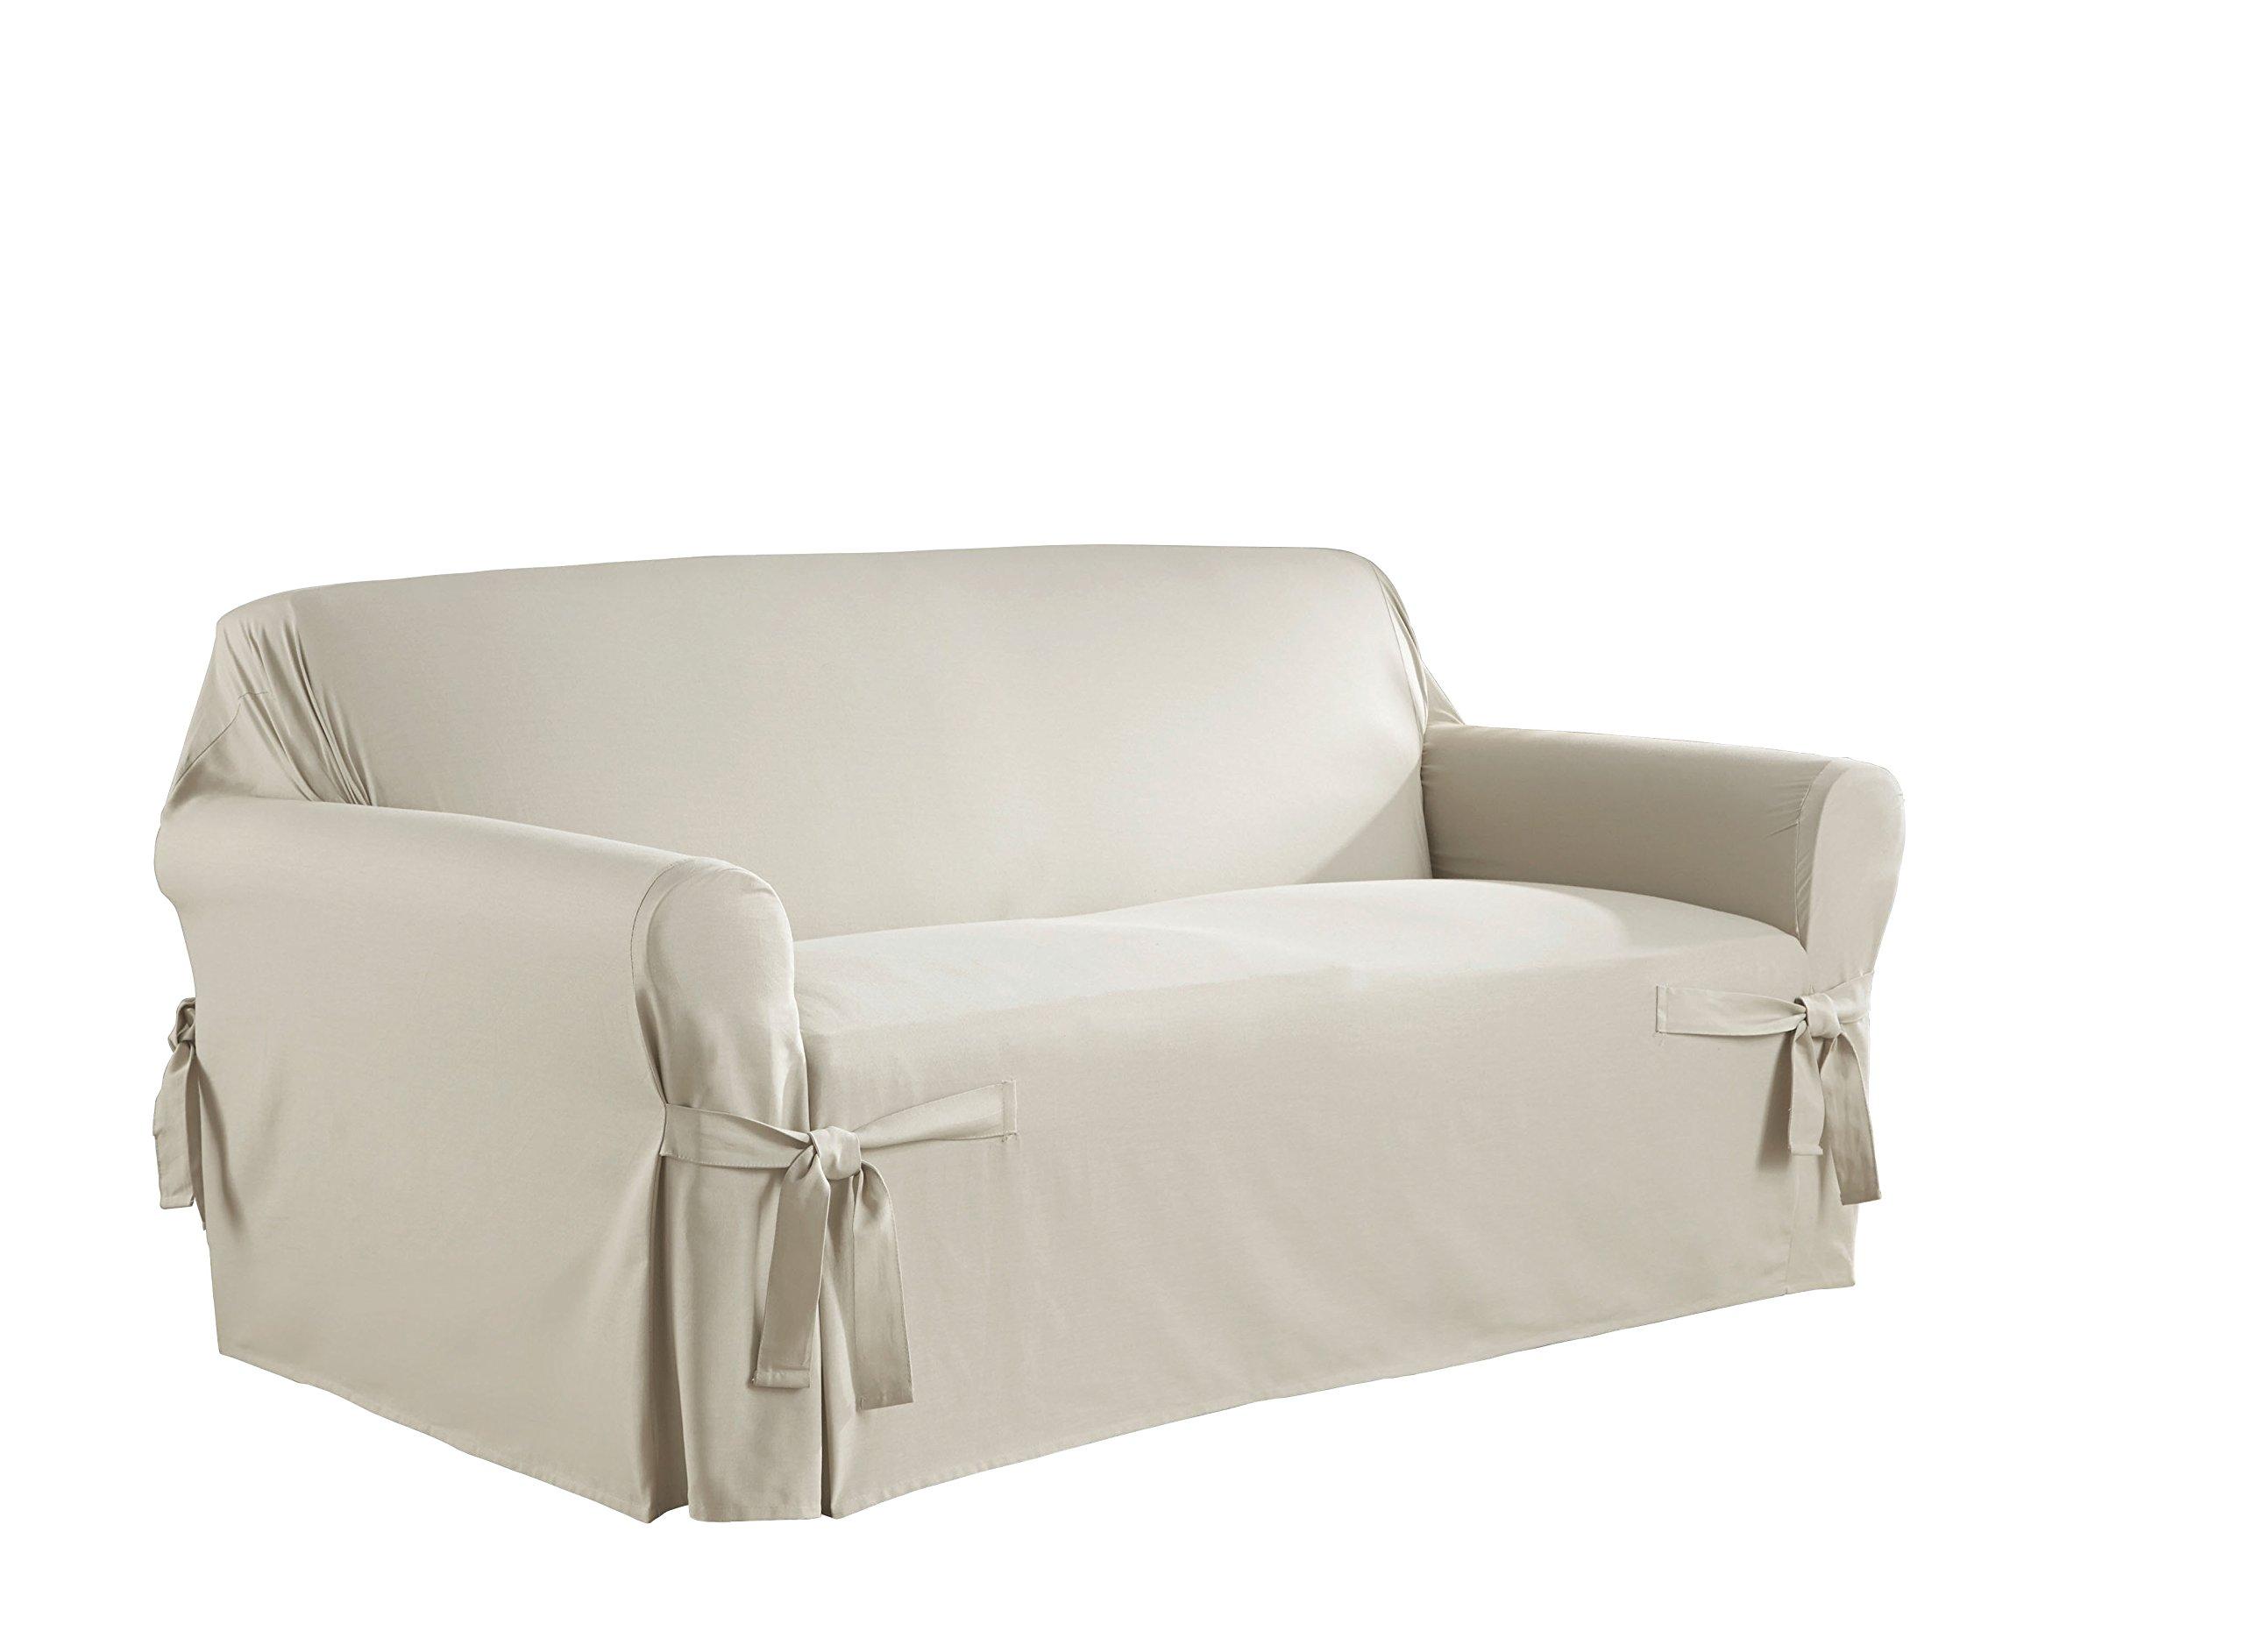 Serta 863045 Relaxed Fit Duck Slipcover Box Loveseat, White by Serta